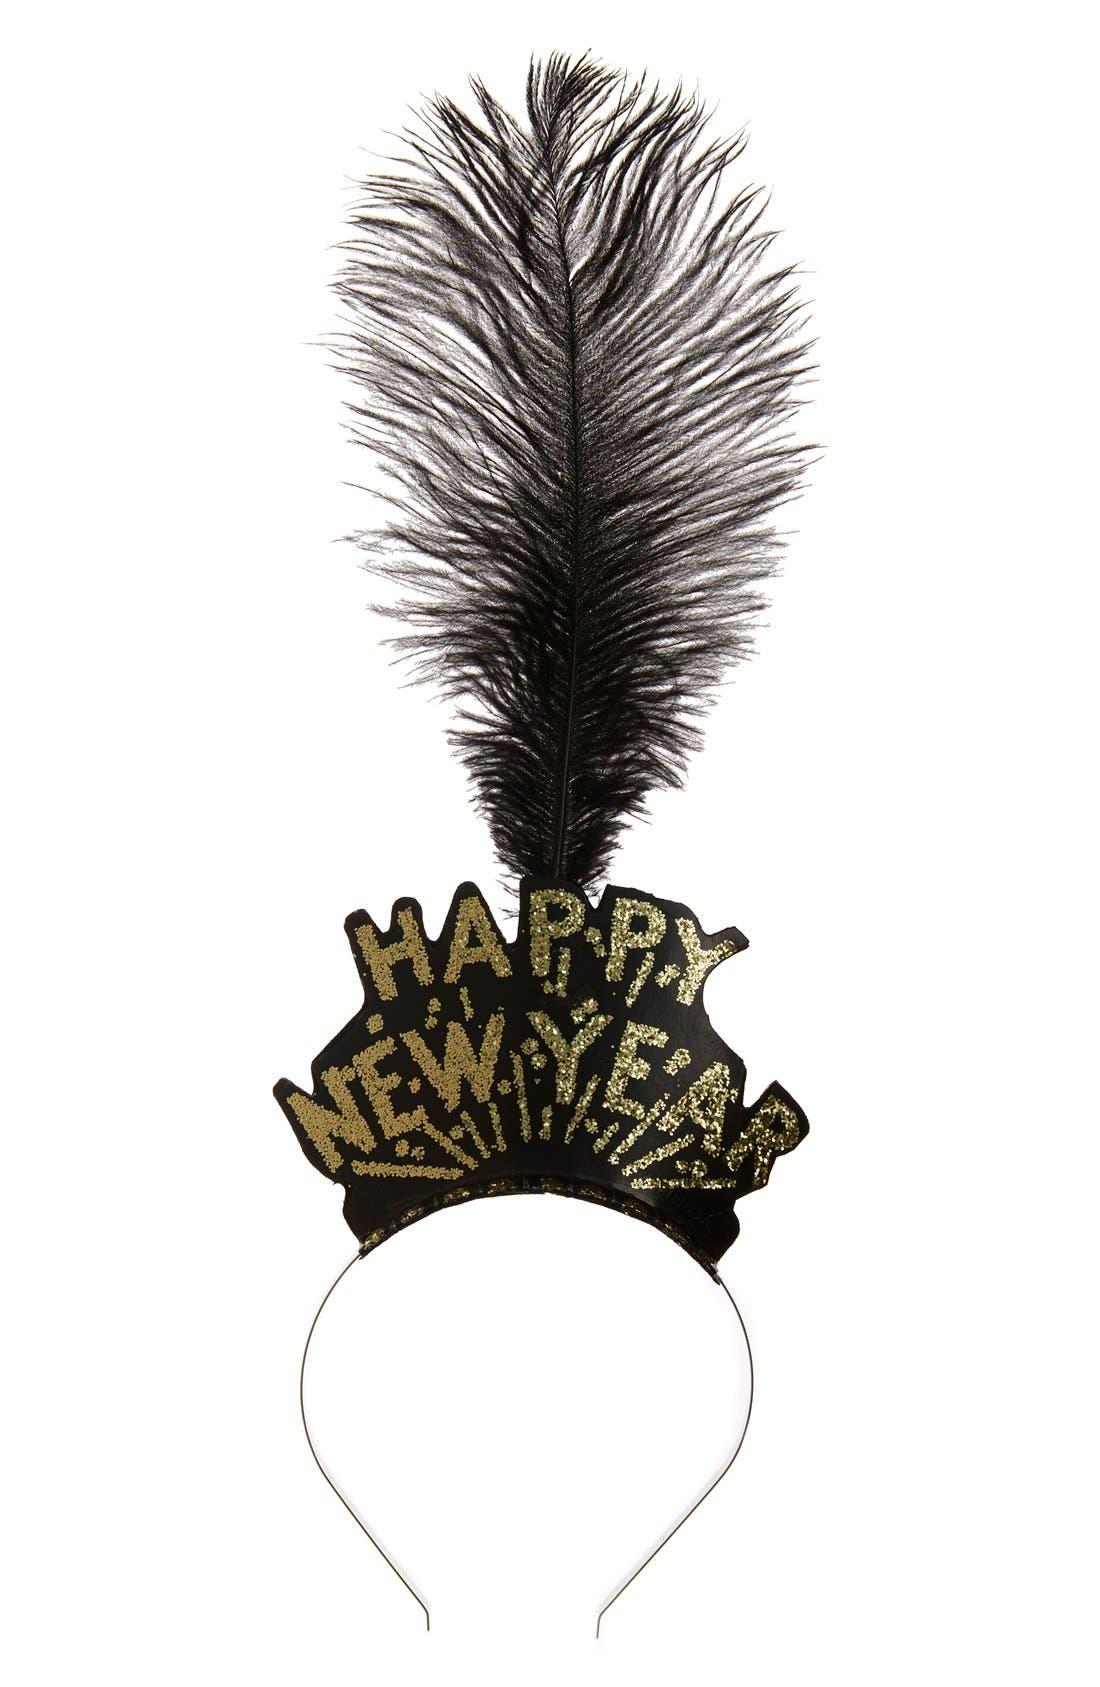 Alternate Image 1 Selected - Cara 'Happy New Year' Headband